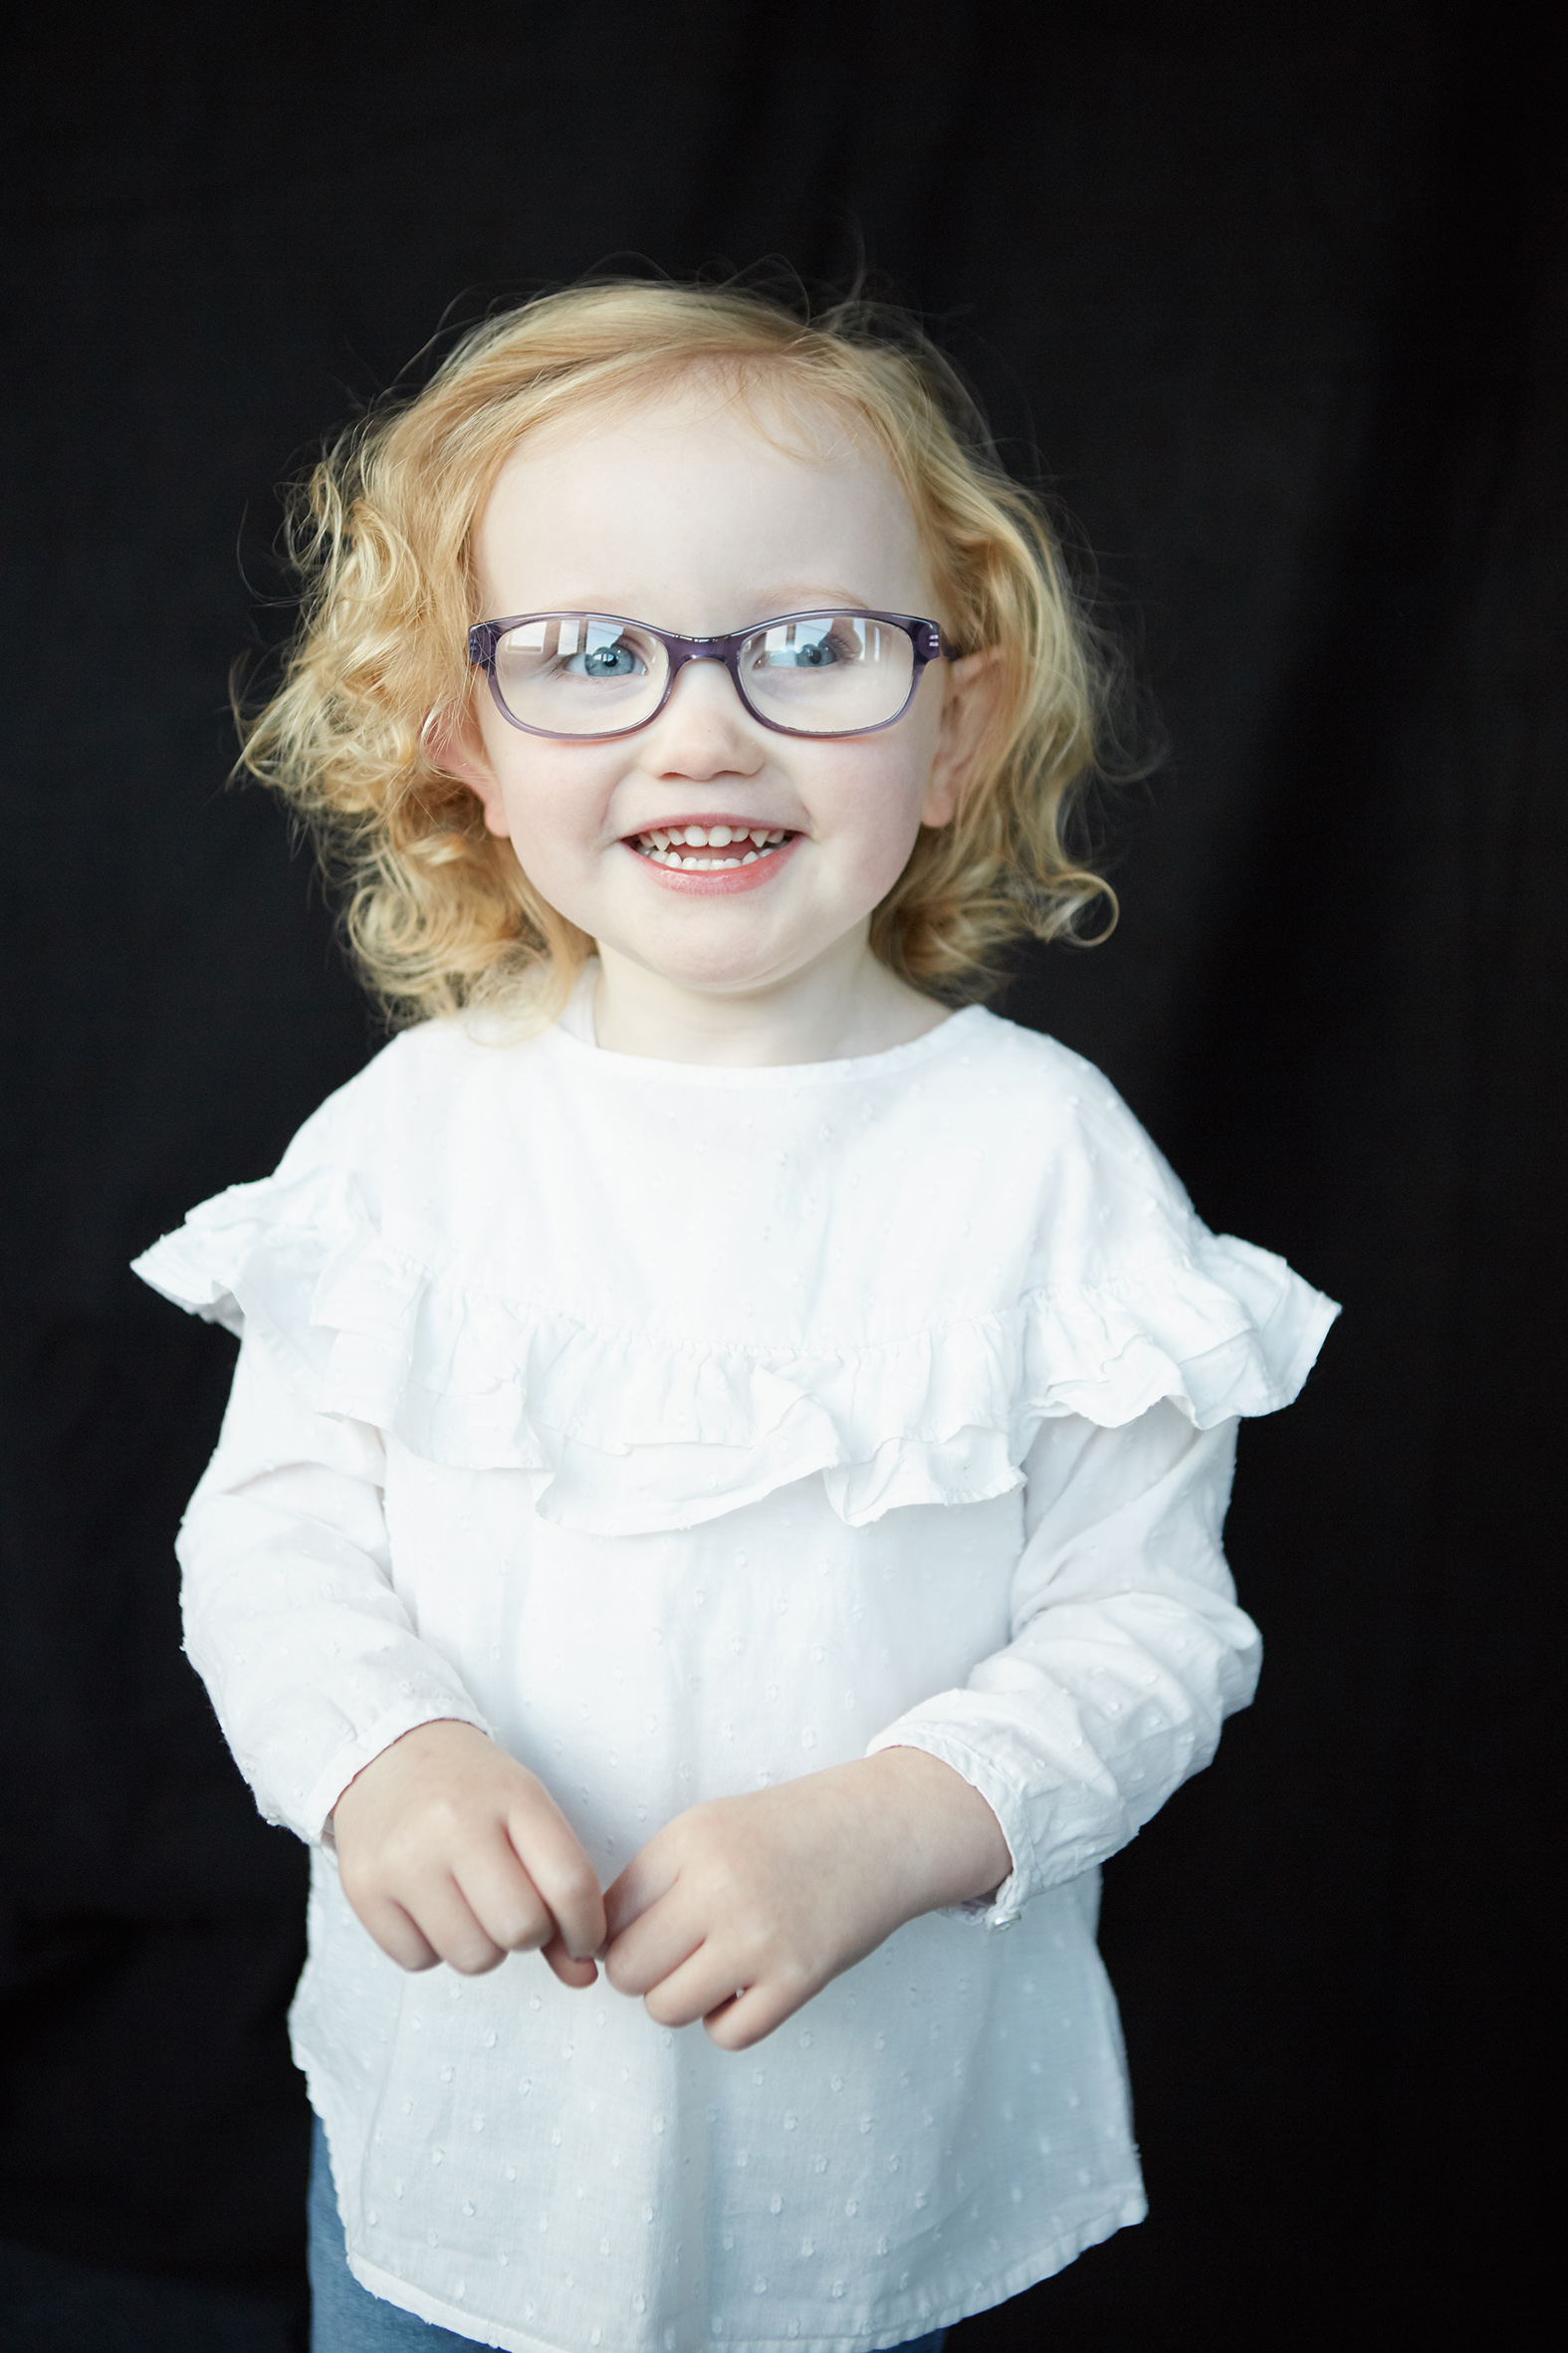 Peyton, Spastic Diplegia Cerebral Palsy,